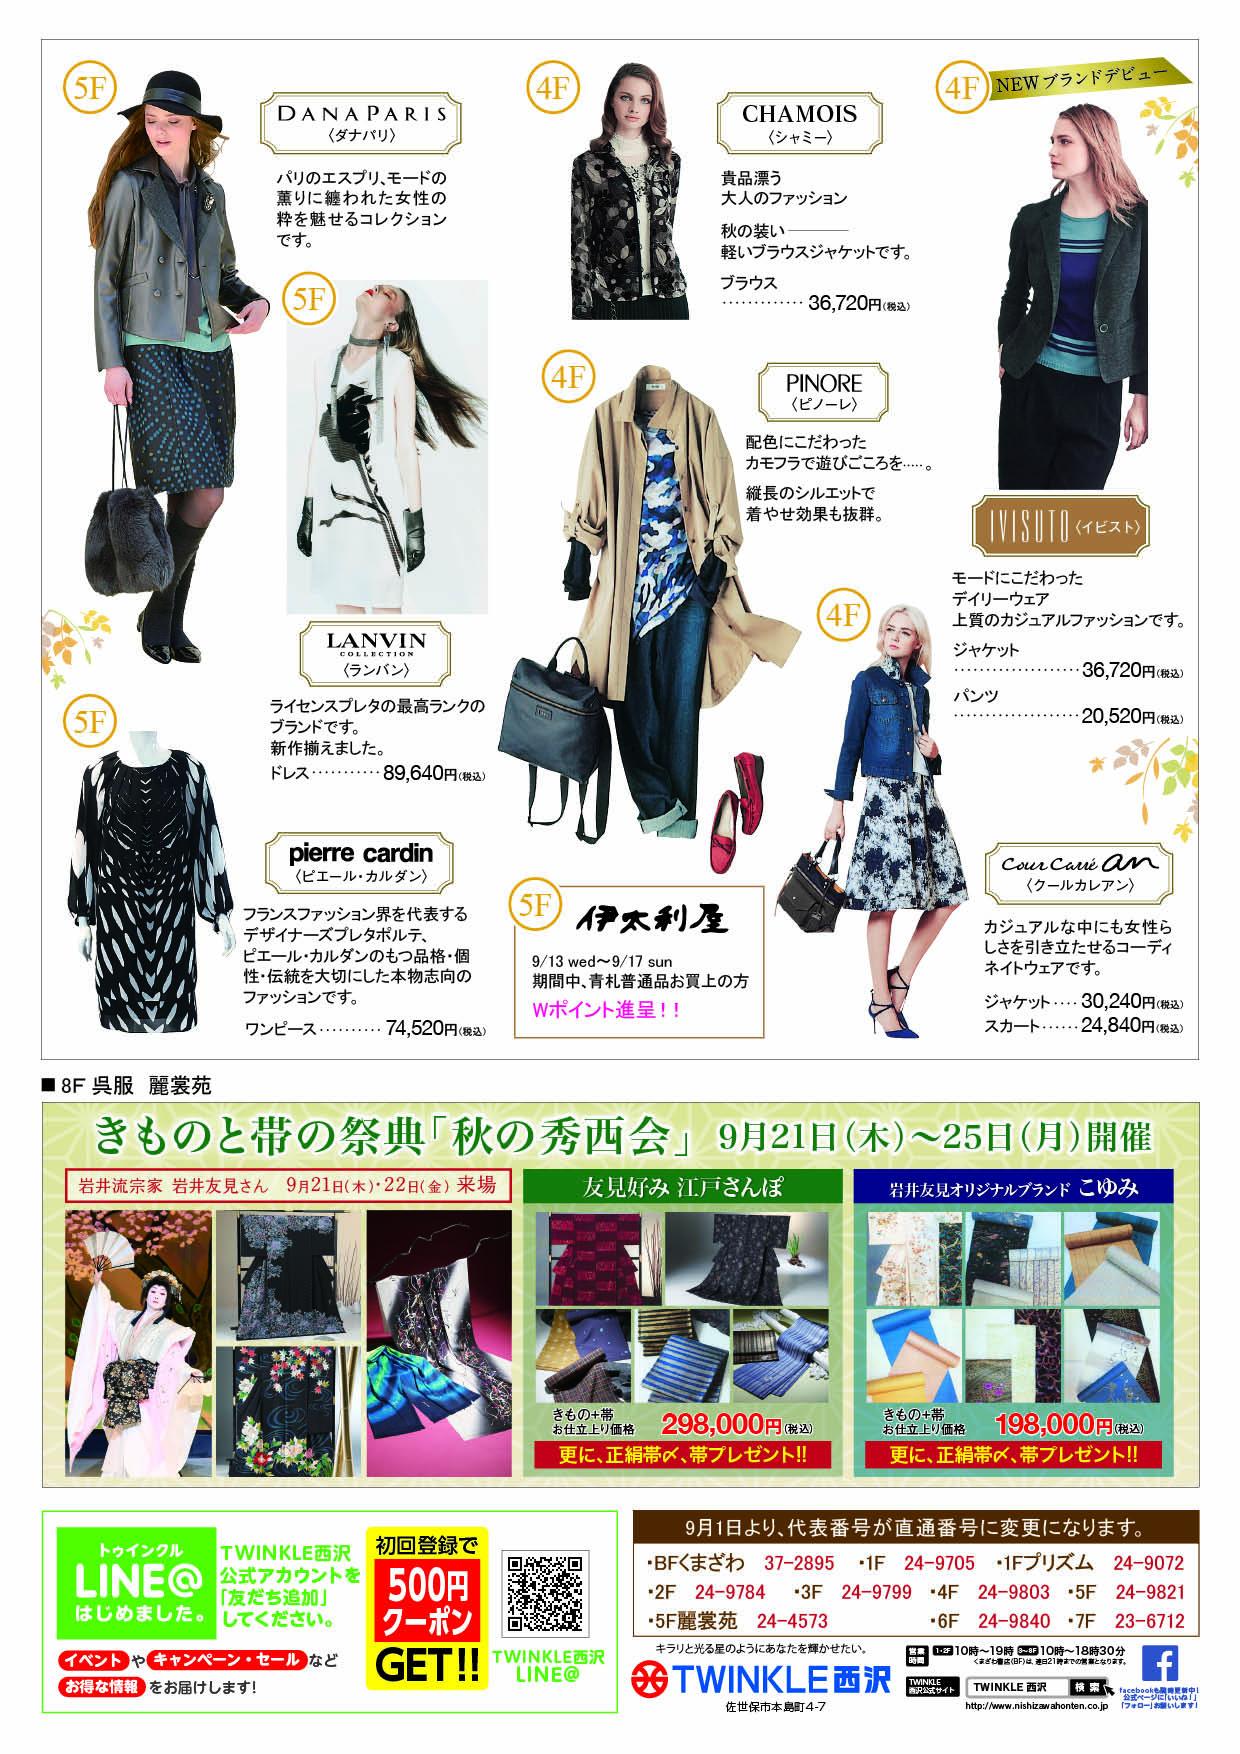 「forecast」A4チラシ3種(9月号)2